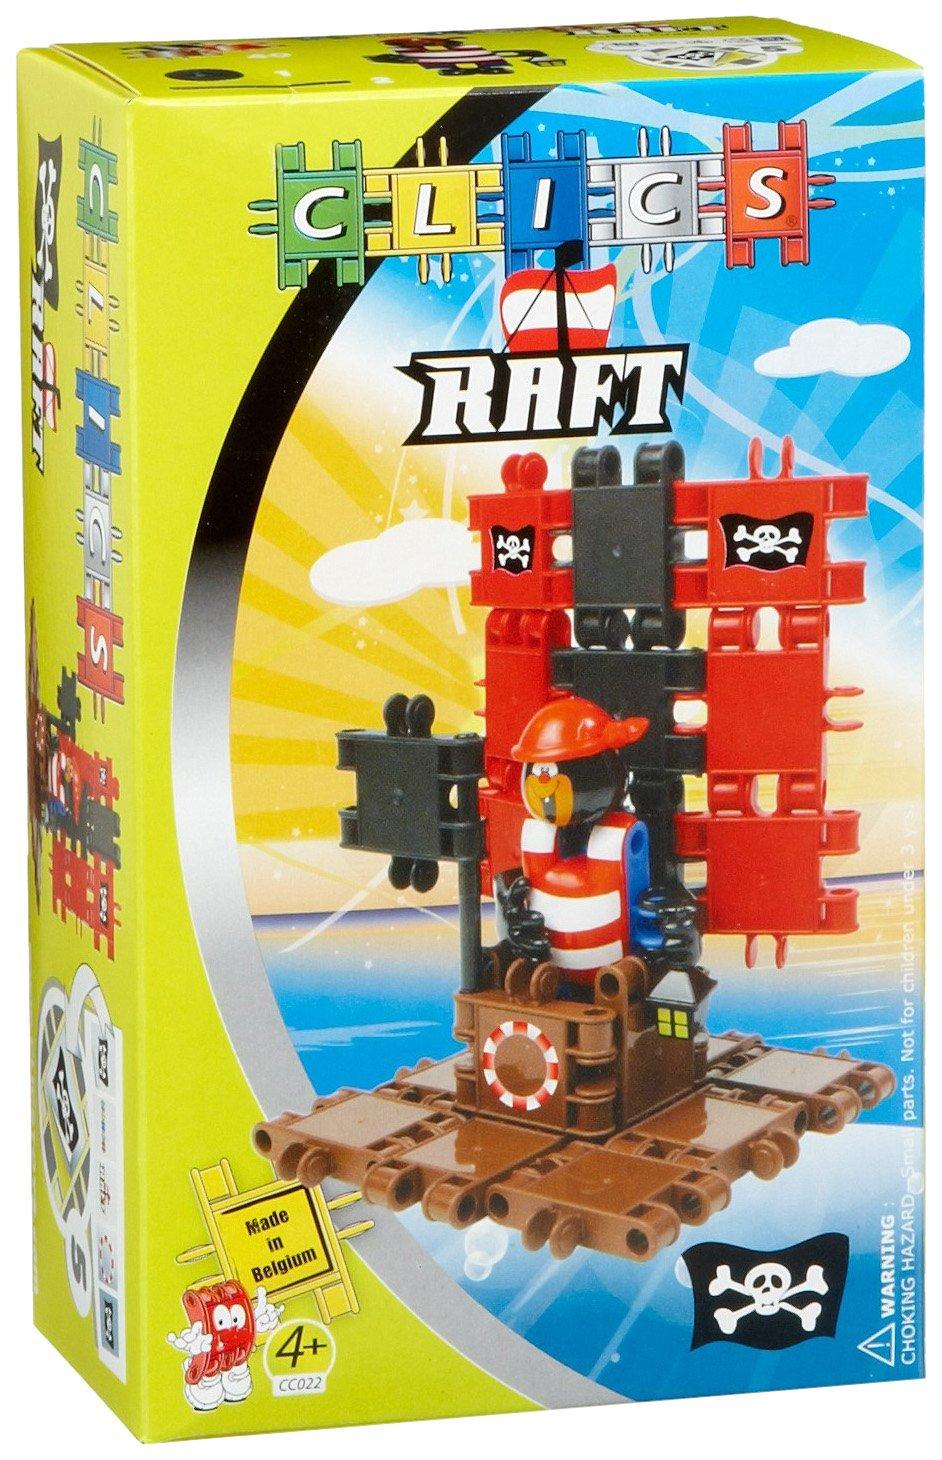 Clics CC022 - Pirat u Floß Combi Modell B003UES898 Bau- & Konstruktionsspielzeug Hohe Sicherheit | Große Auswahl